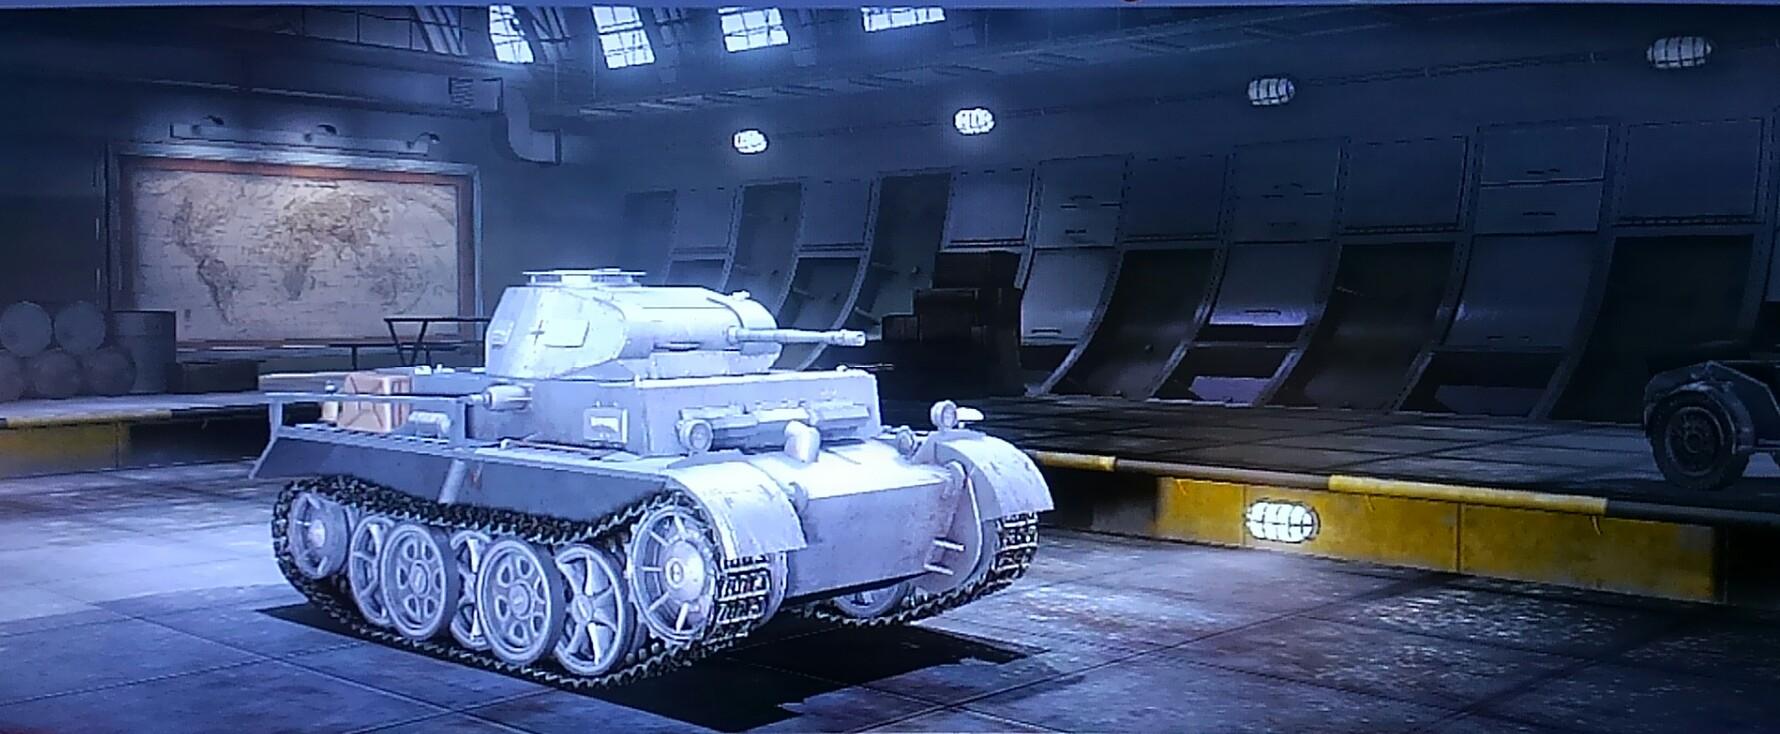 1_Pz.Kpfw._II_Ausf.G.JPG